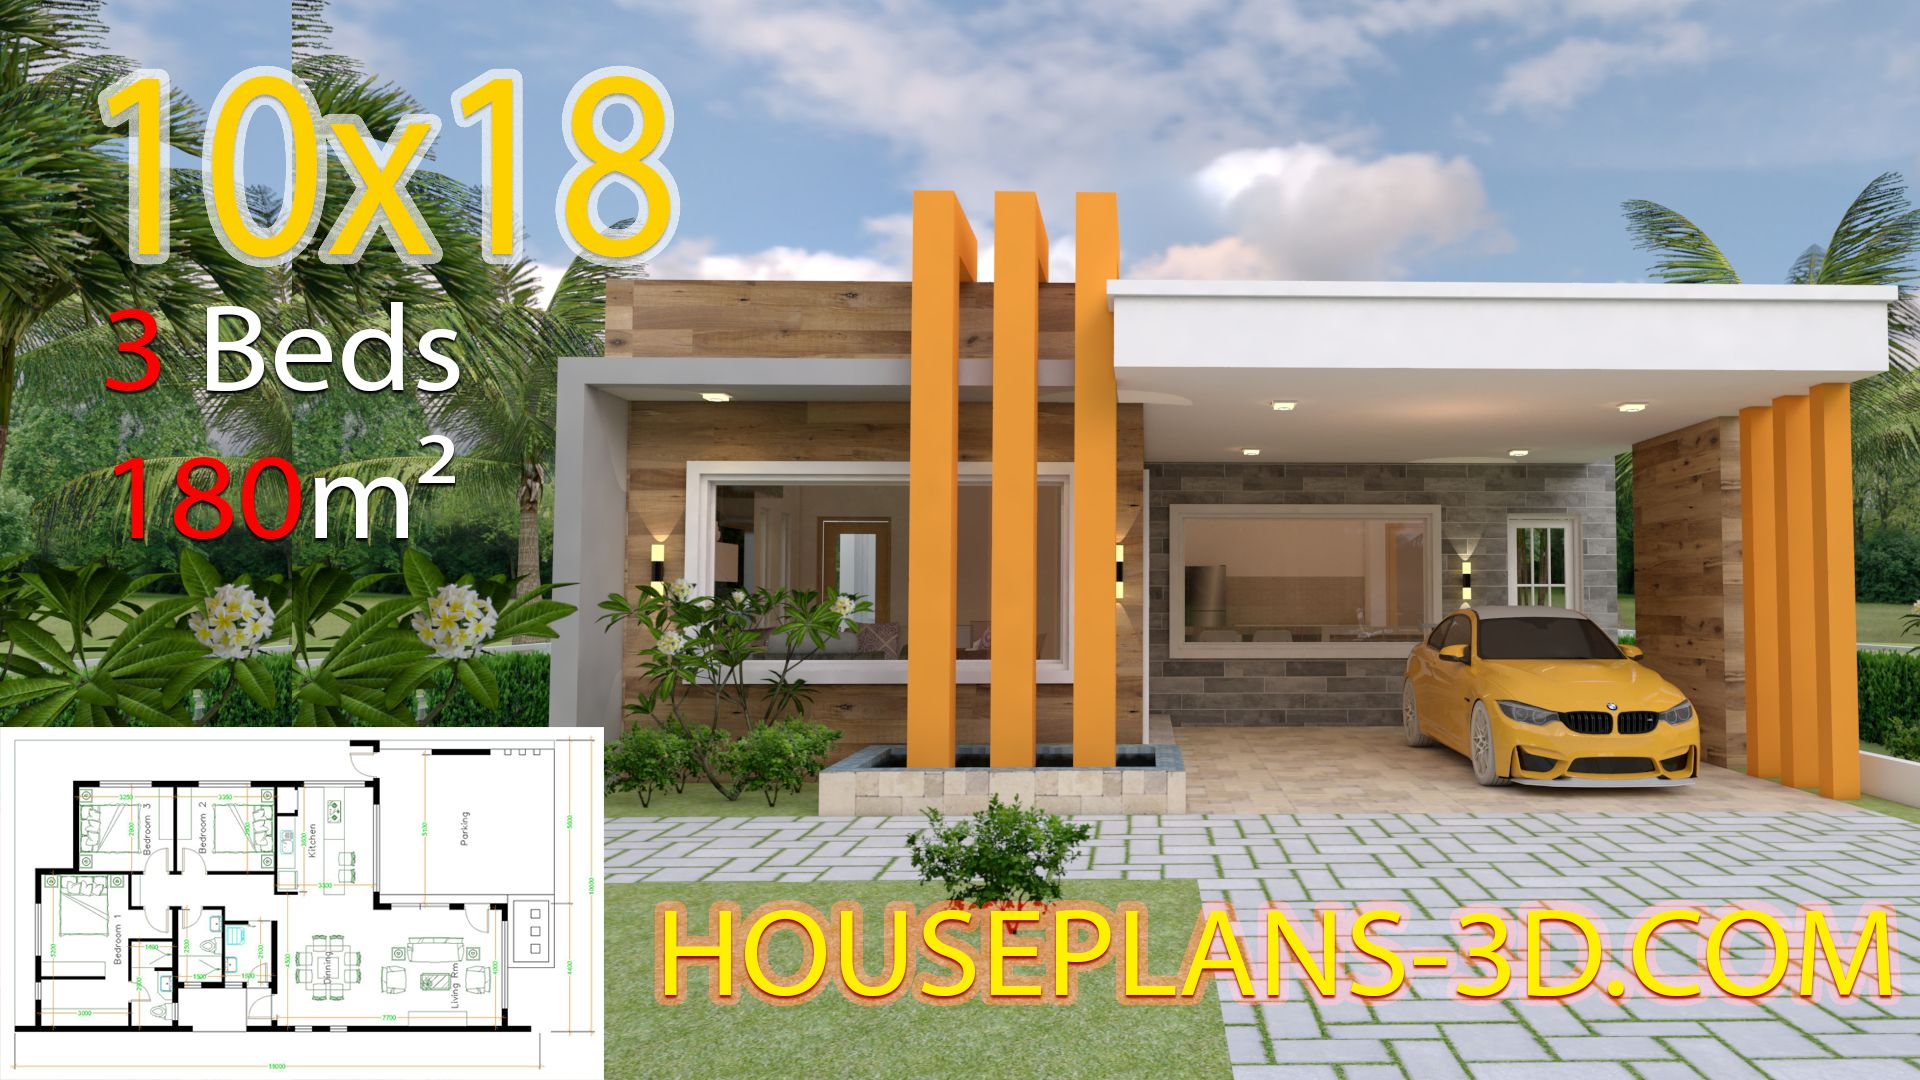 House Design 10x18 With 3 Bedrooms Terrace Roof House Plans 3d House Plans House Construction Plan House Design